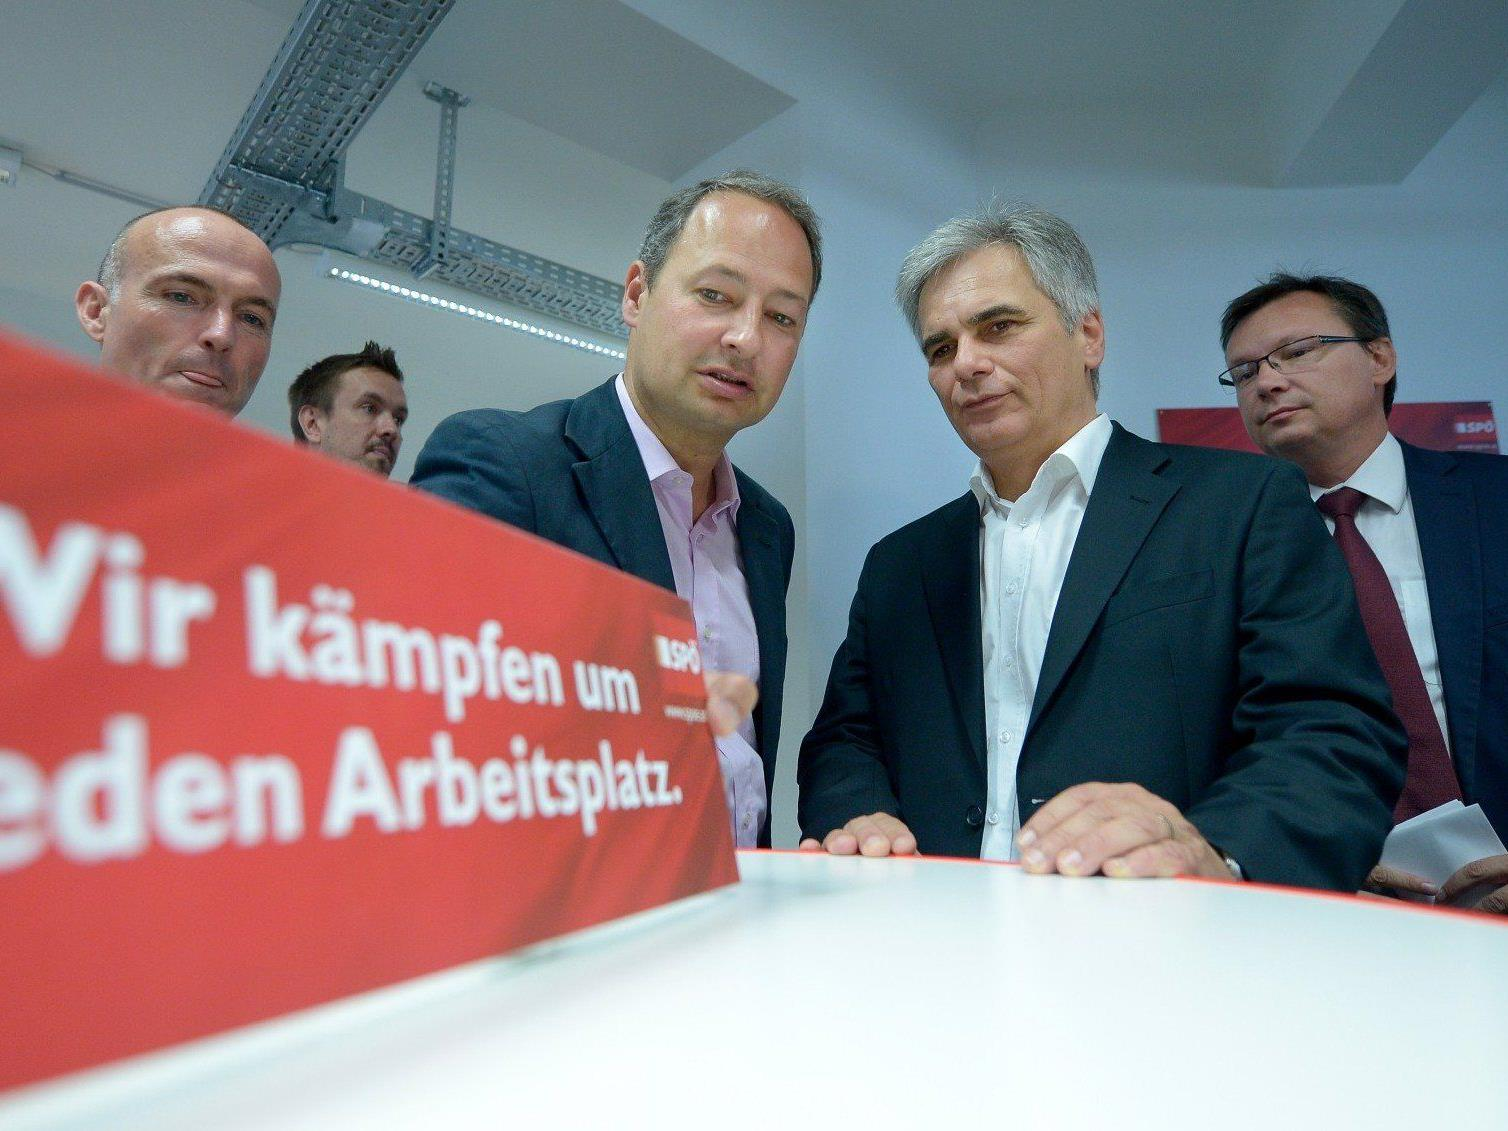 Werner Faymann eröffnete die SPÖ-Wahlkampfzentrale in Wien.